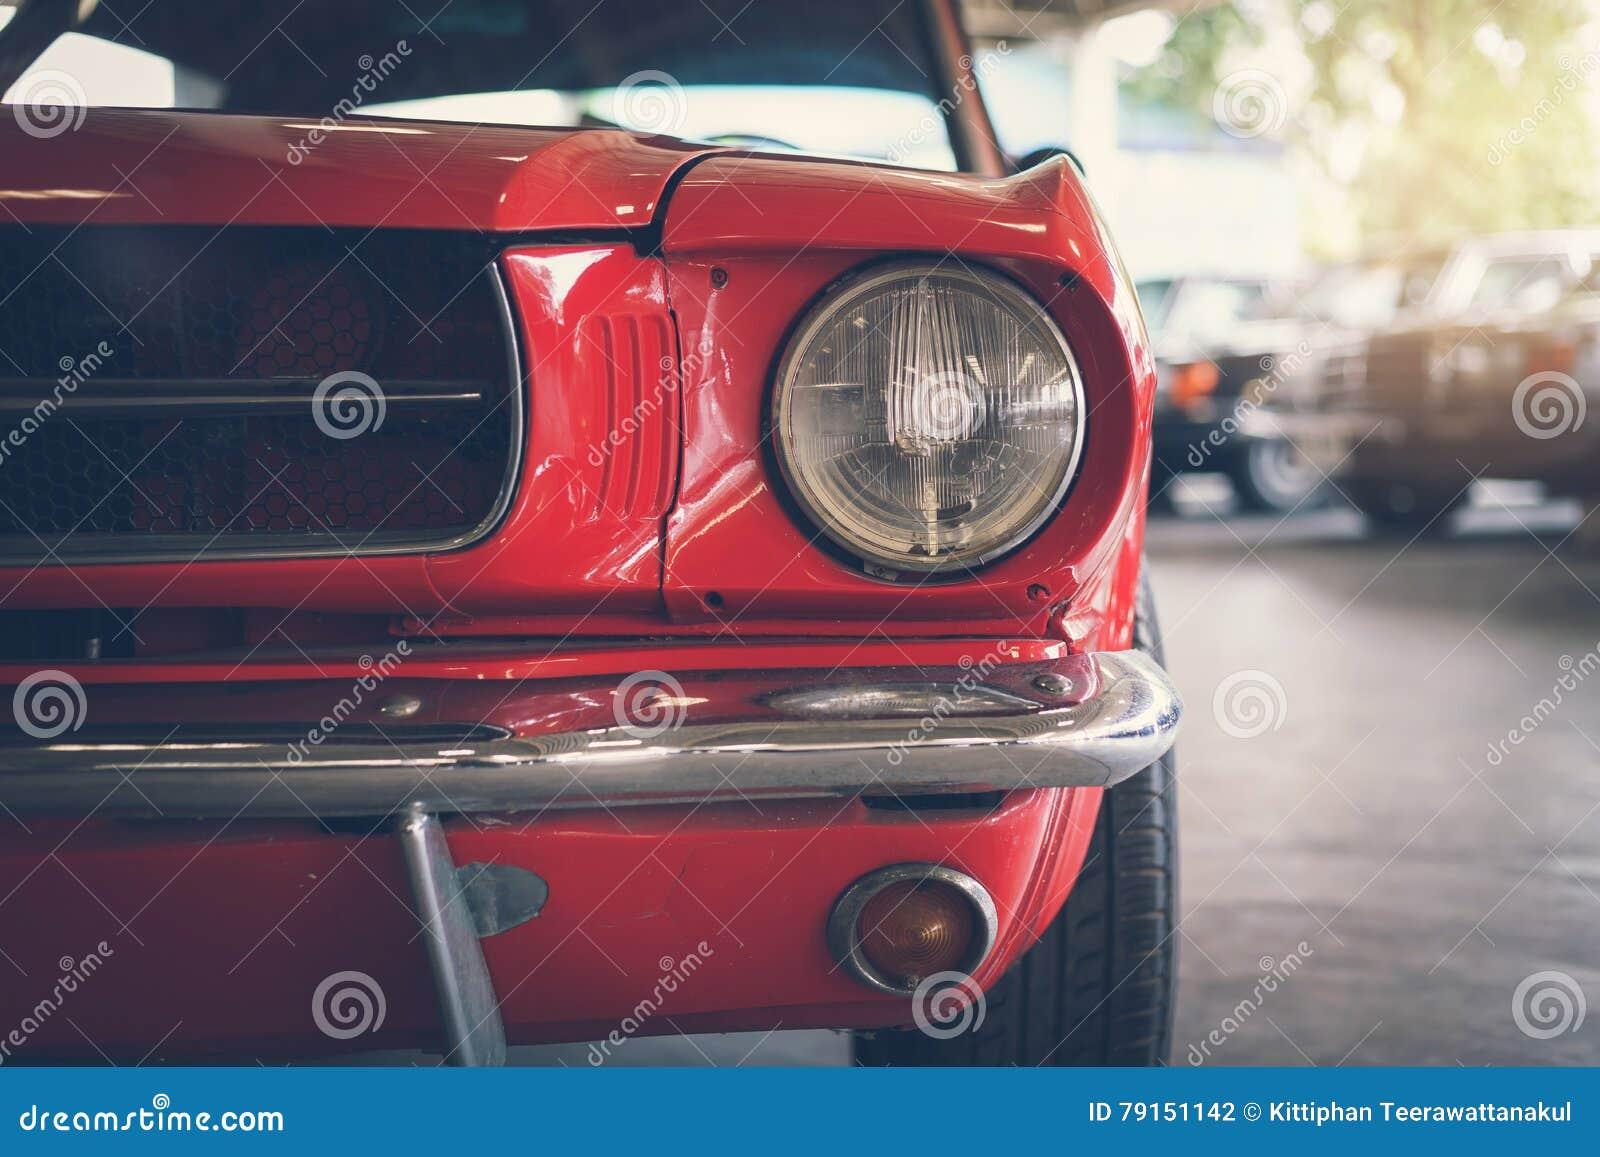 Vintage Auto Headlight Styles : Close up headlight of red retro classic car stock photo